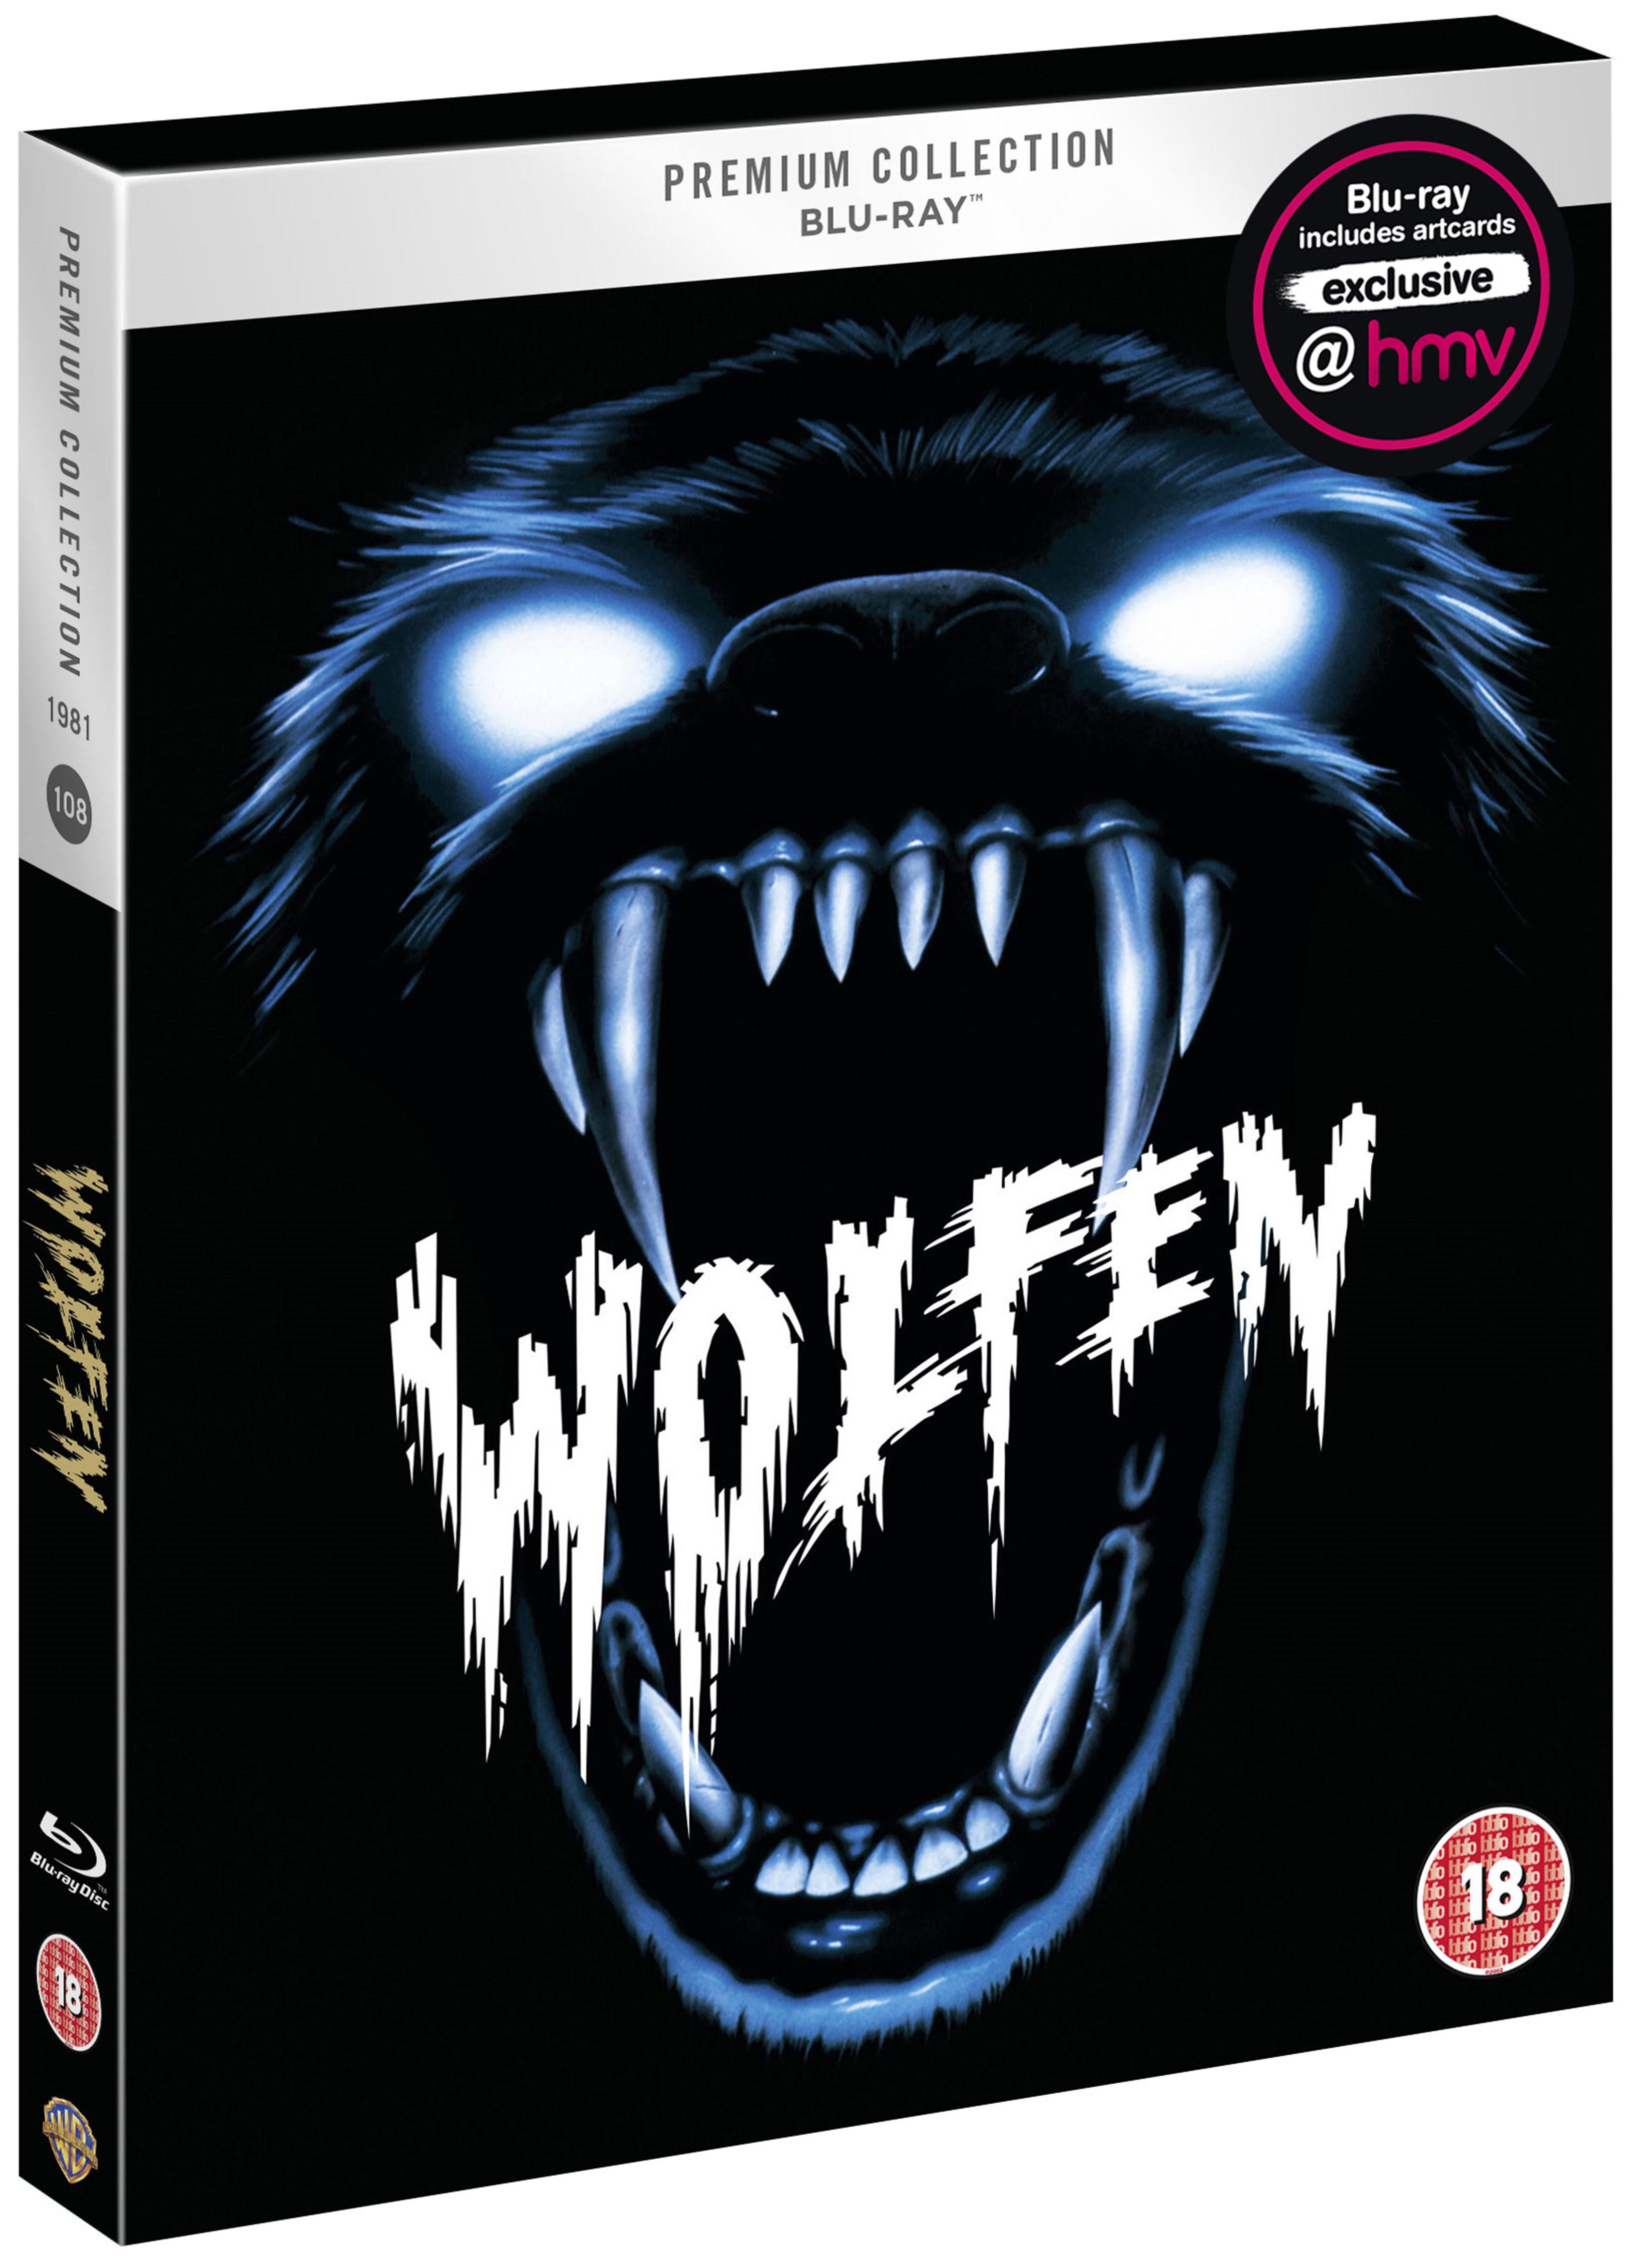 Wolfen (hmv Exclusive) - The Premium Collection - 2